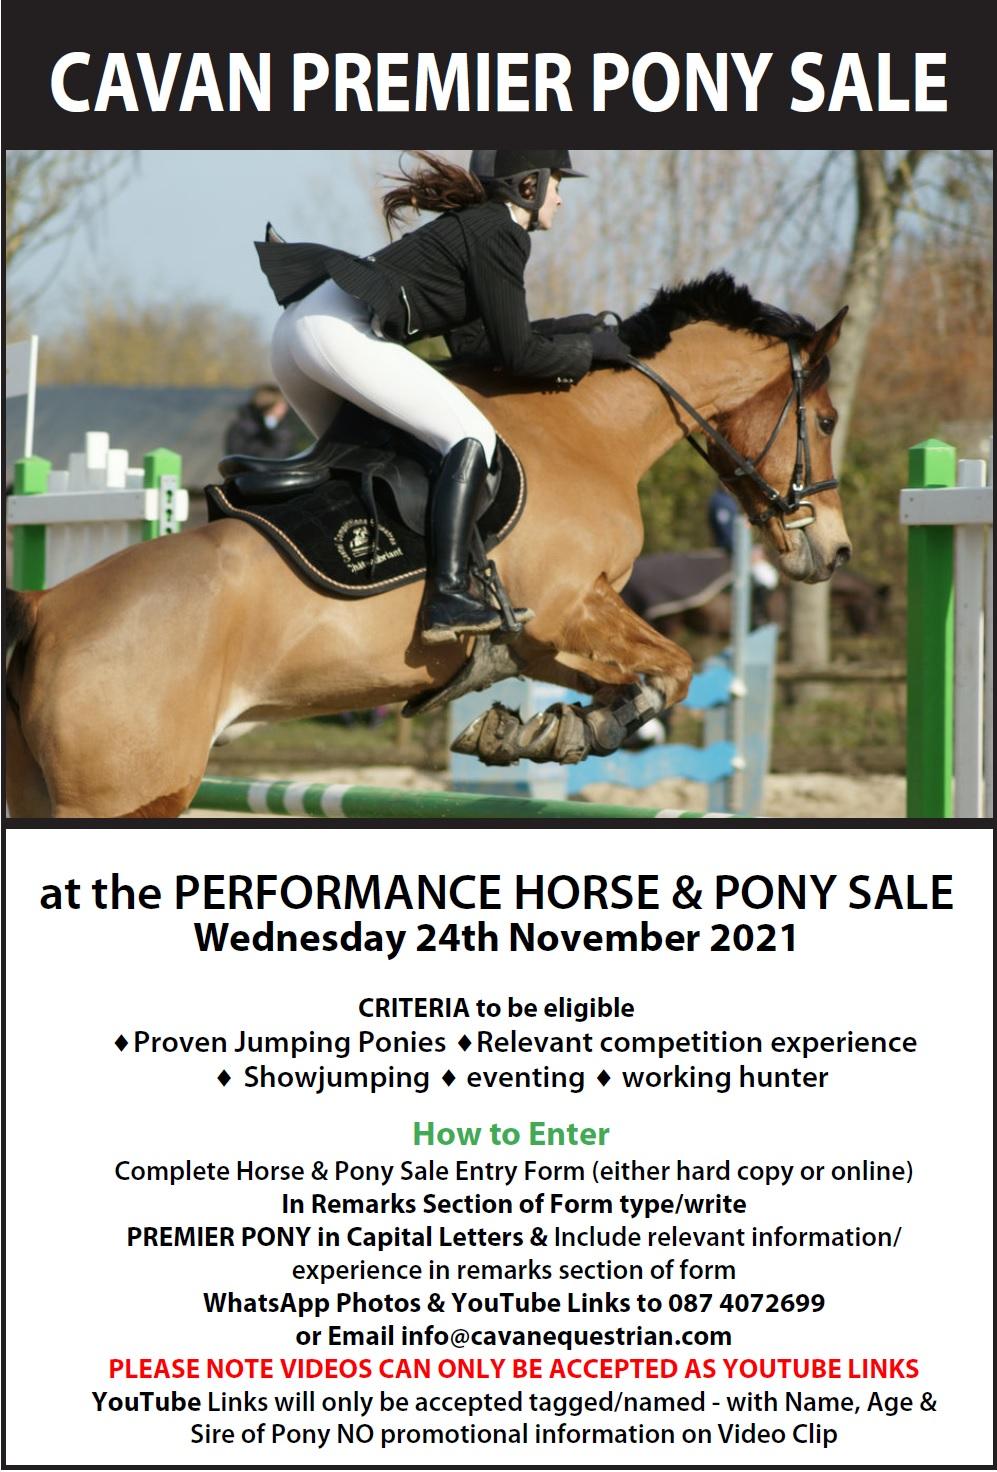 Cavan Premier Pony Sale